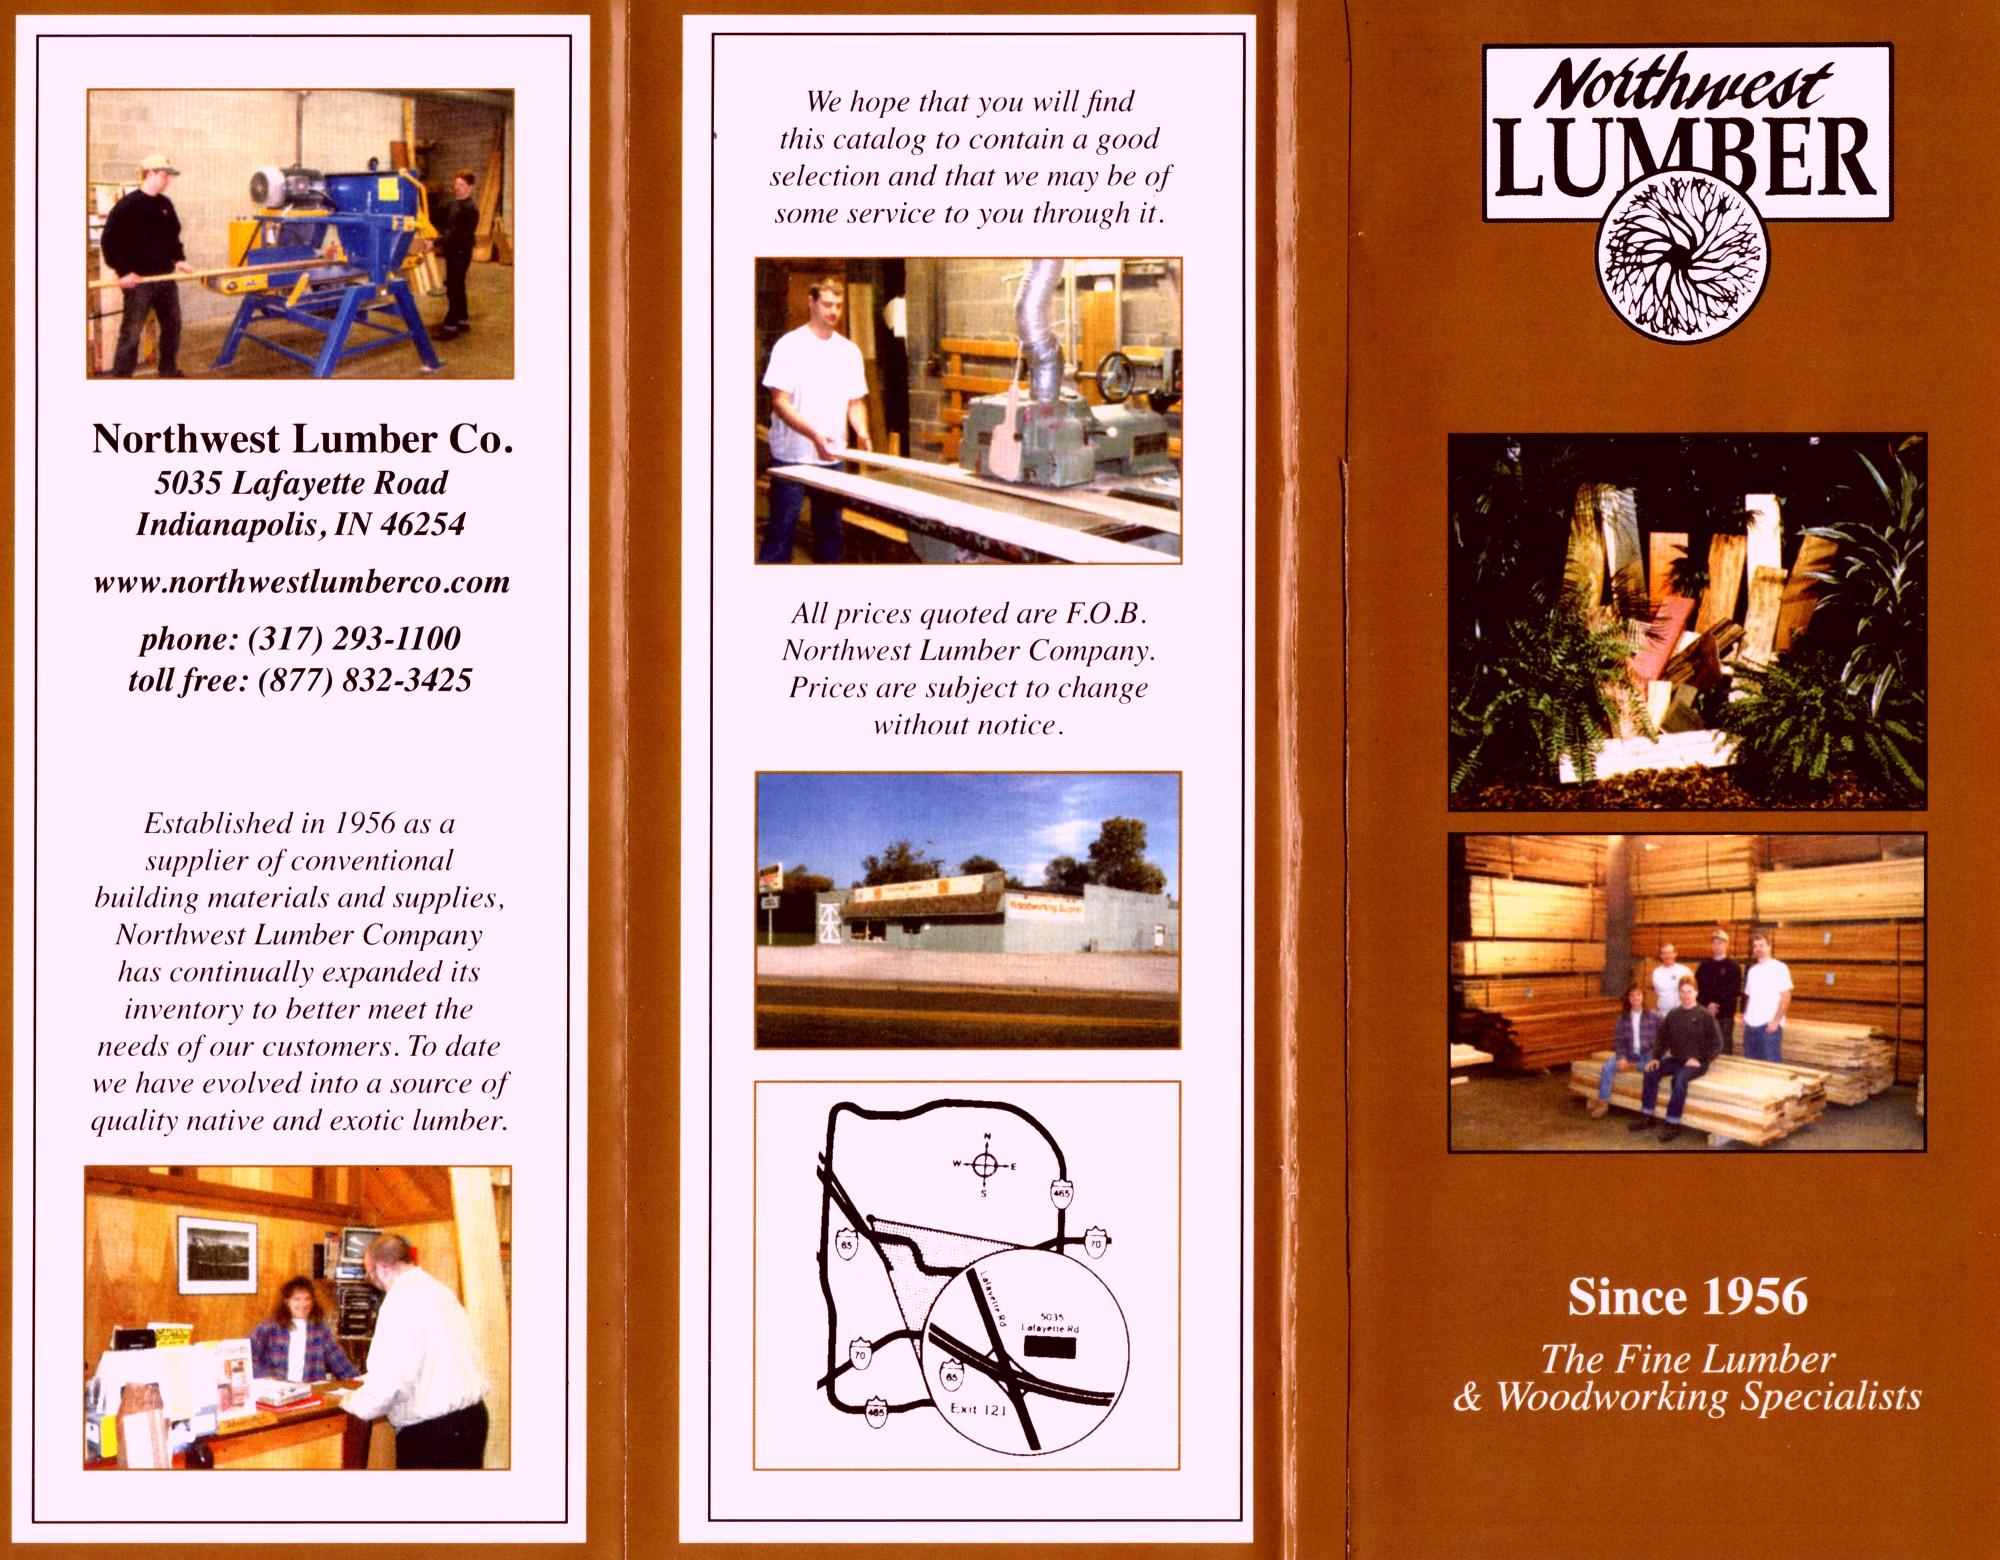 Northwest Lumber